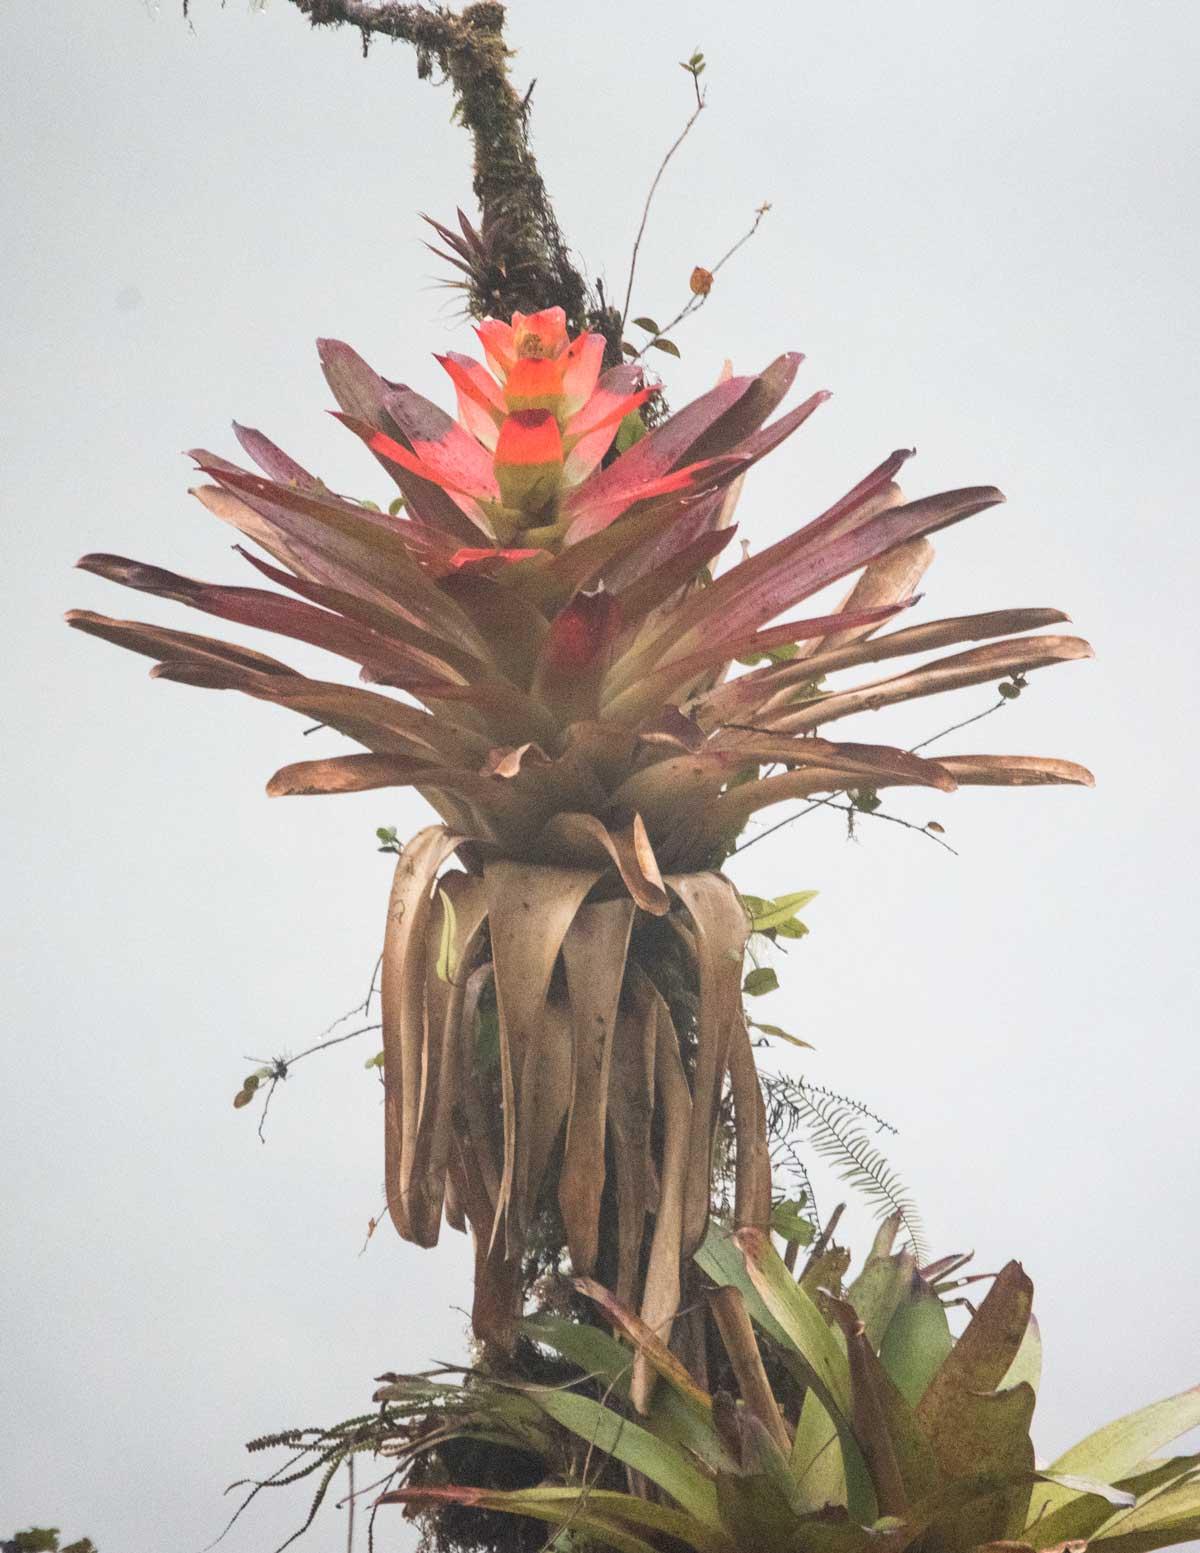 A red bromeliad shines even on rainy day, Tapichalaca Reserve, Ecuador | ©Angela Drake